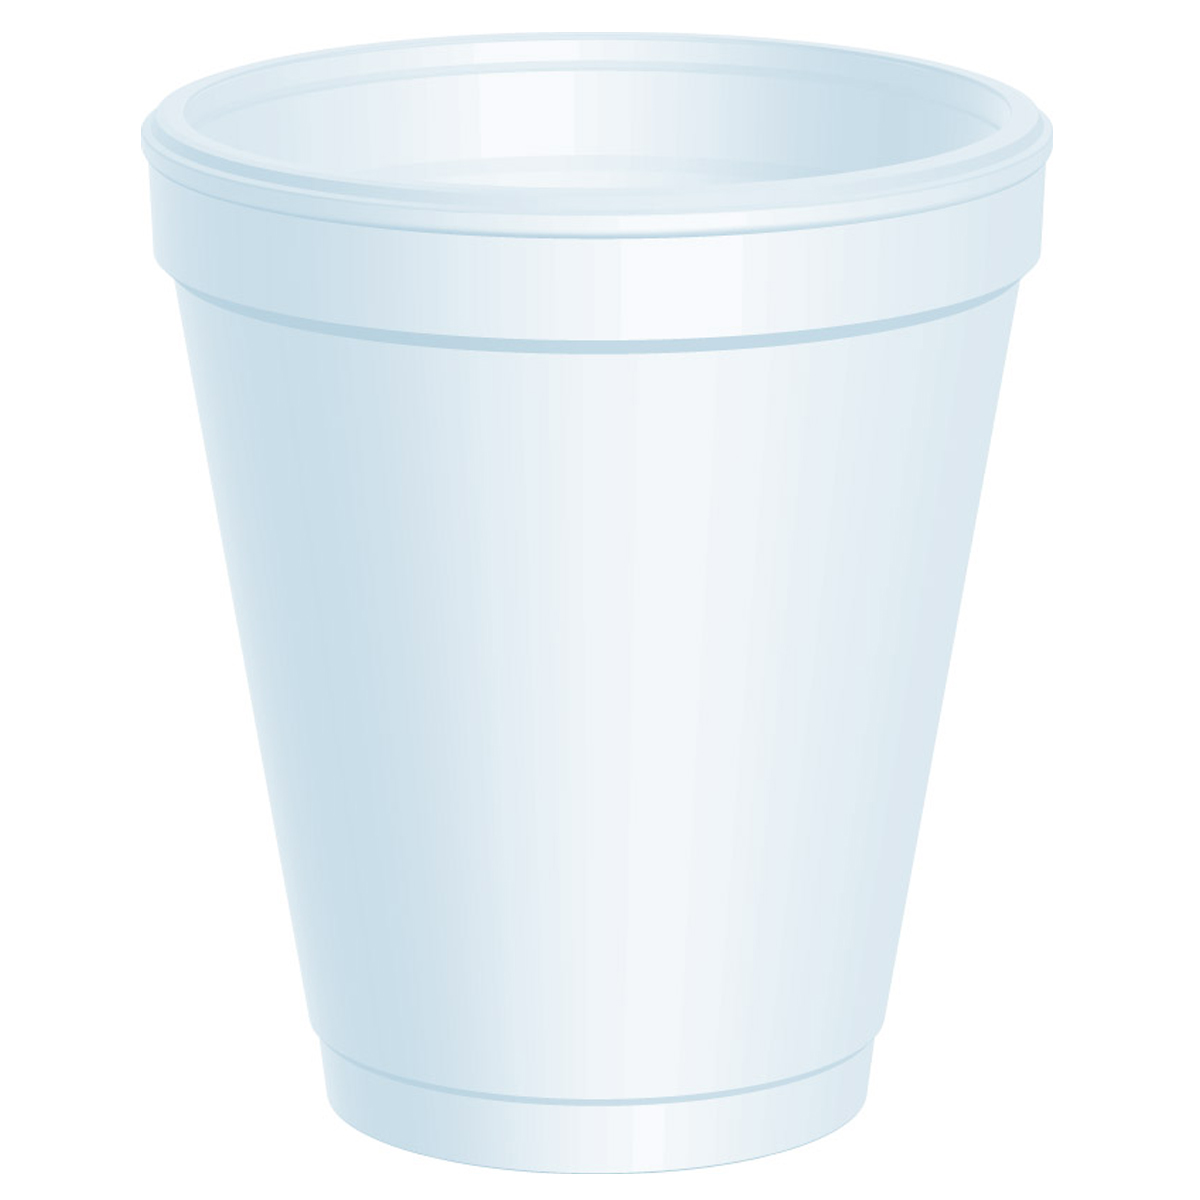 Plastic clipart styrofoam cup #8